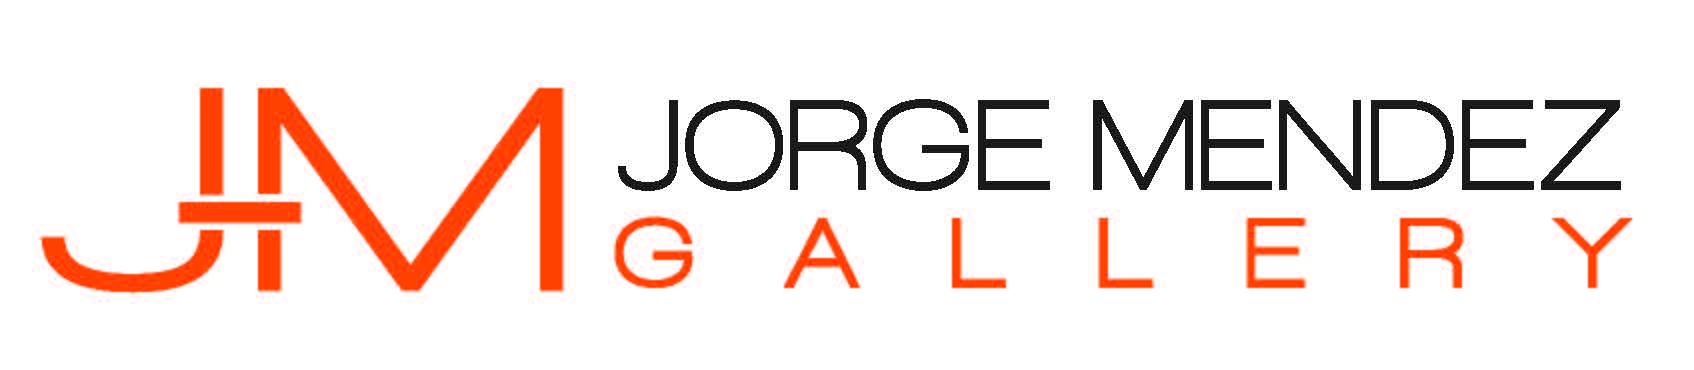 JORGE MENDEZ GALLERY, LLC